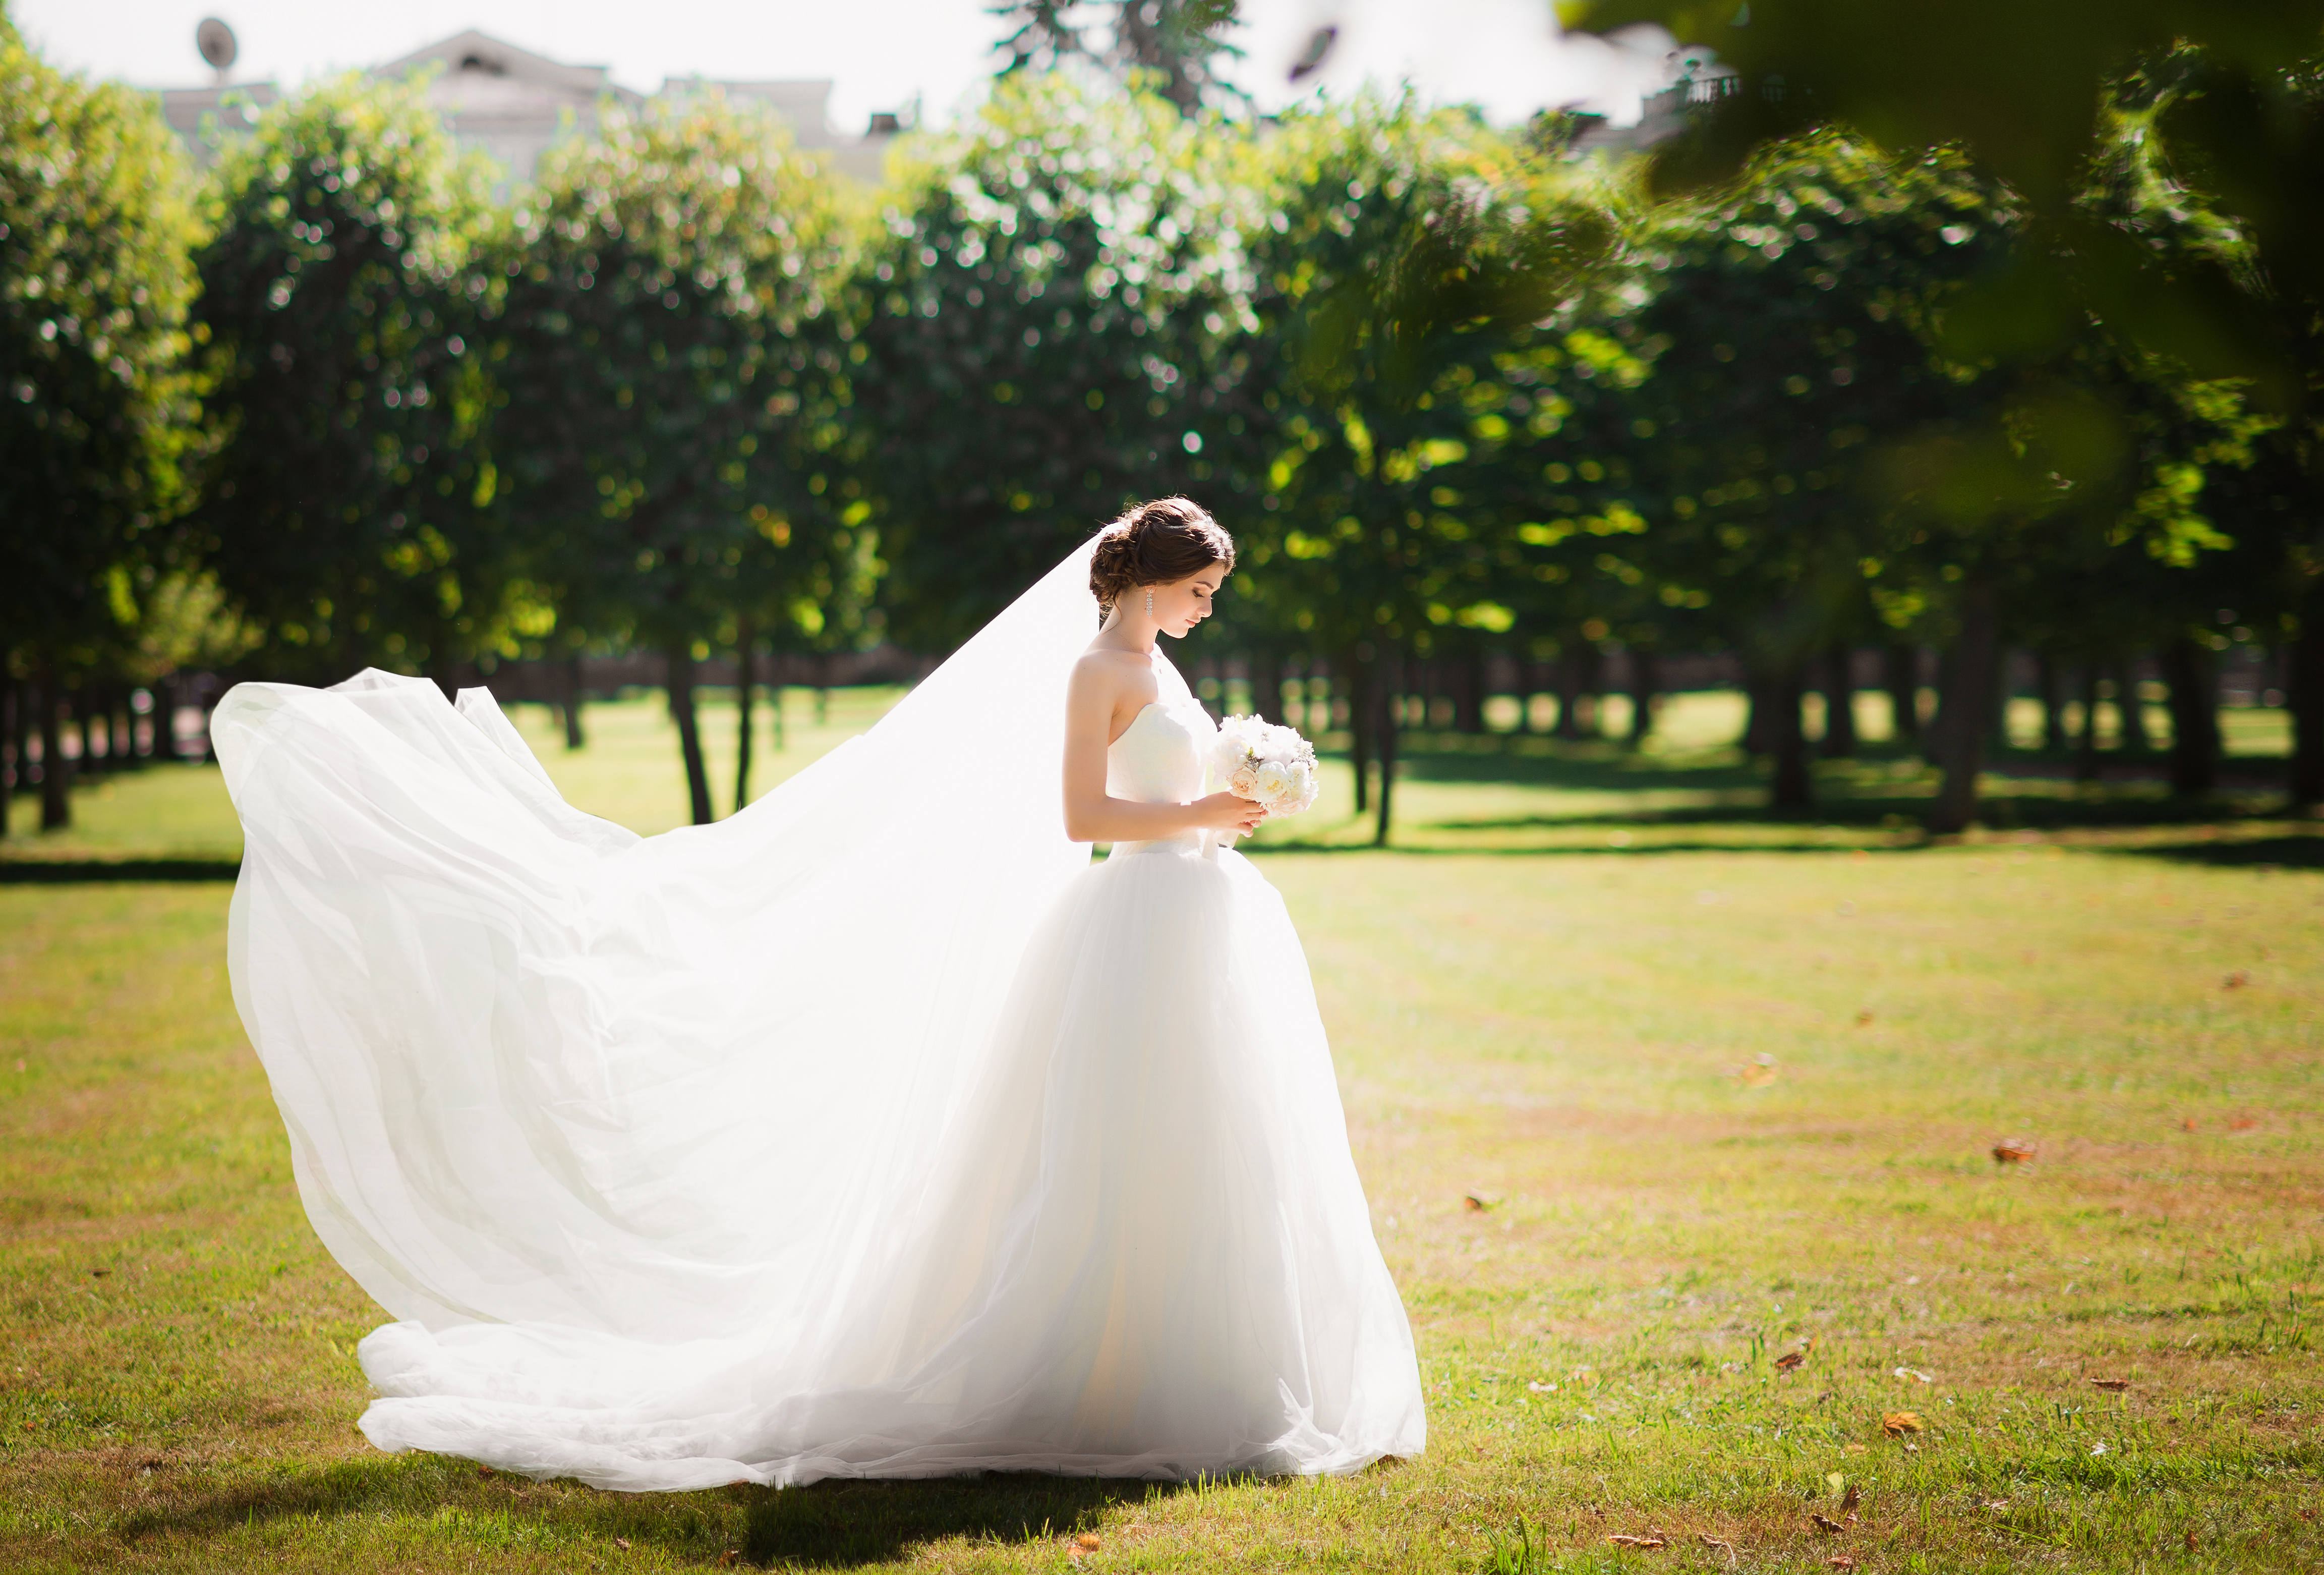 успеешь фотосток фотографии невест брал яндекса других